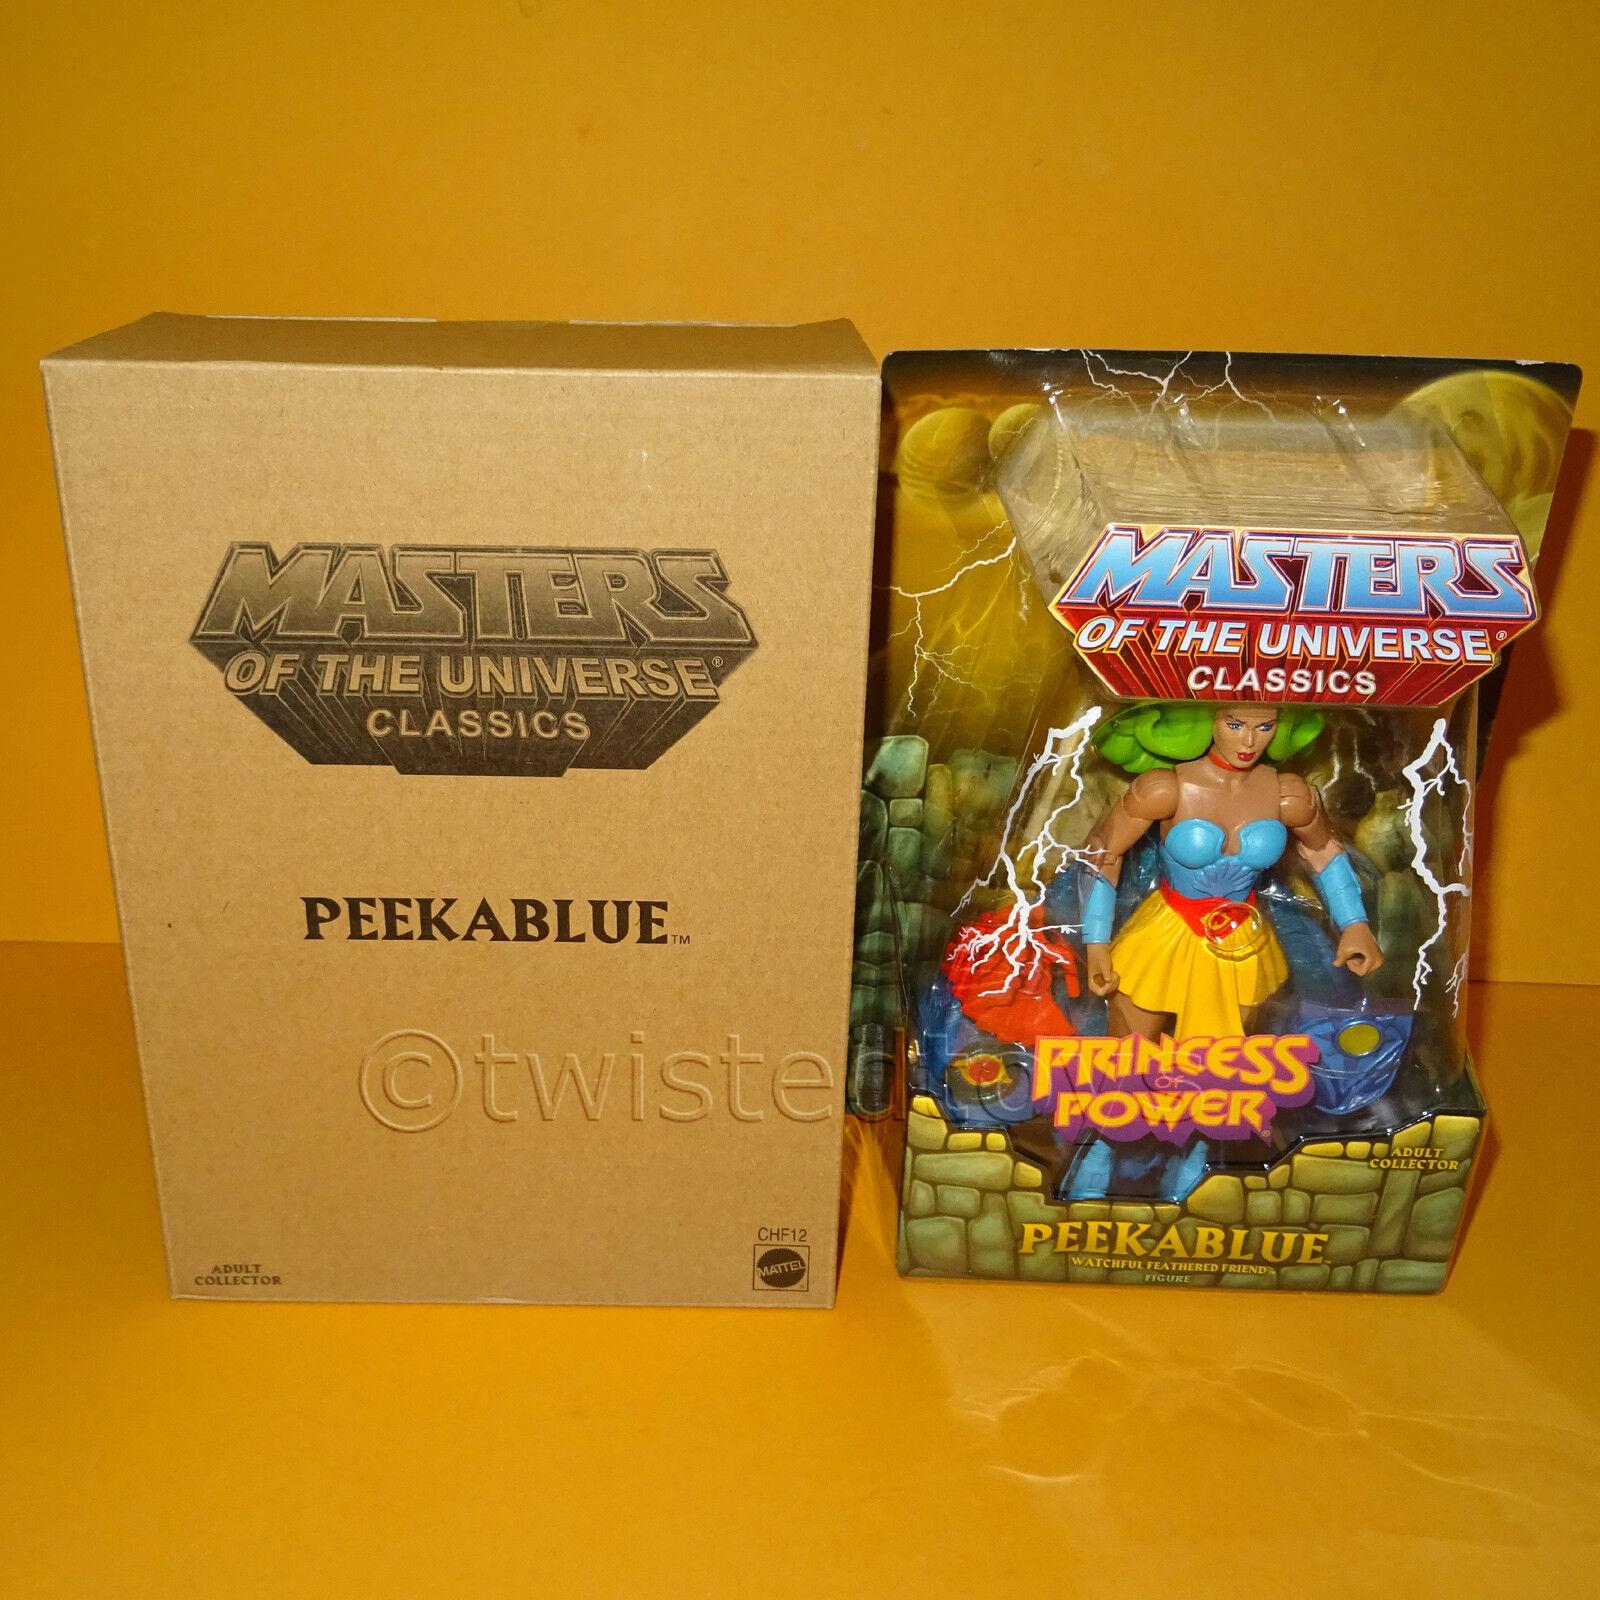 2014 MATTEL MOTU HE-MAN MASTERS OF THE UNIVERSE CLASSICS PEEKABlau (SHE-RA) MOC